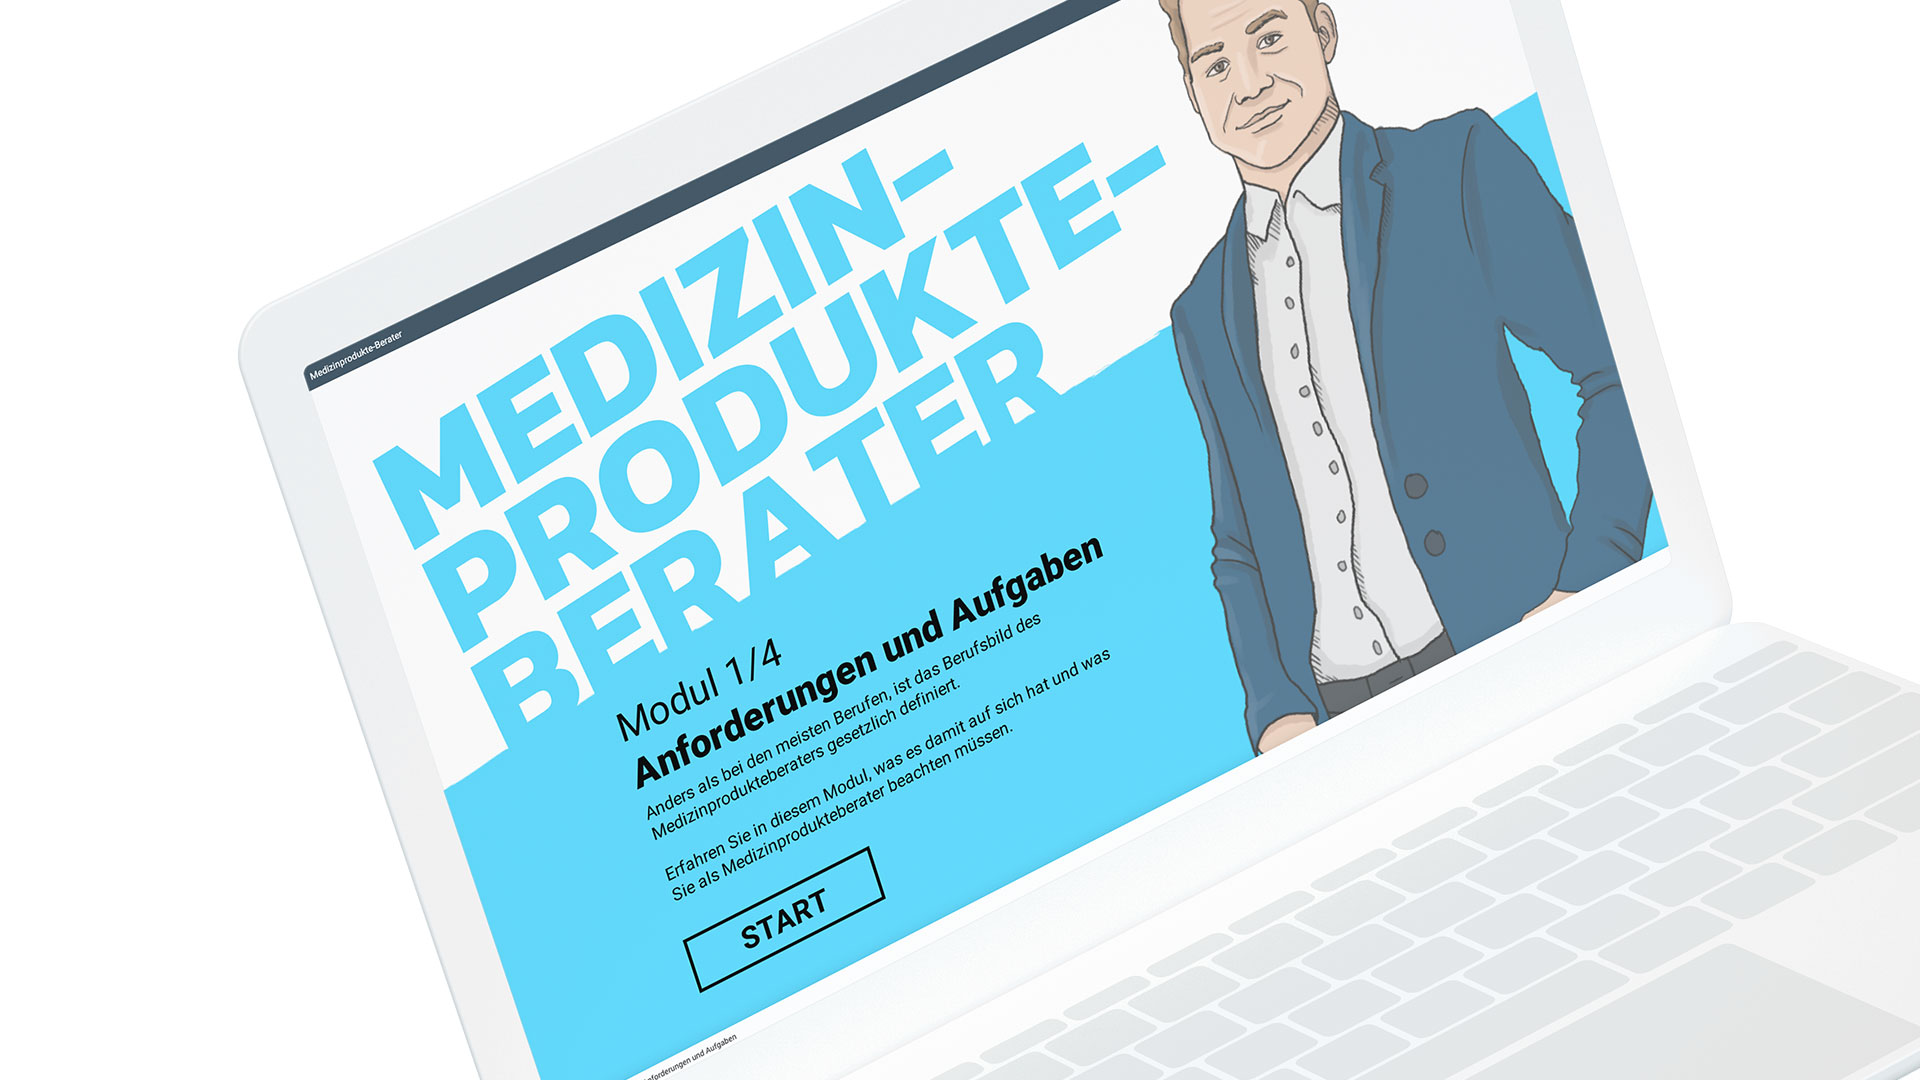 E-Learning Bundle Medizinprodukteberater Medizinproduktegesetz